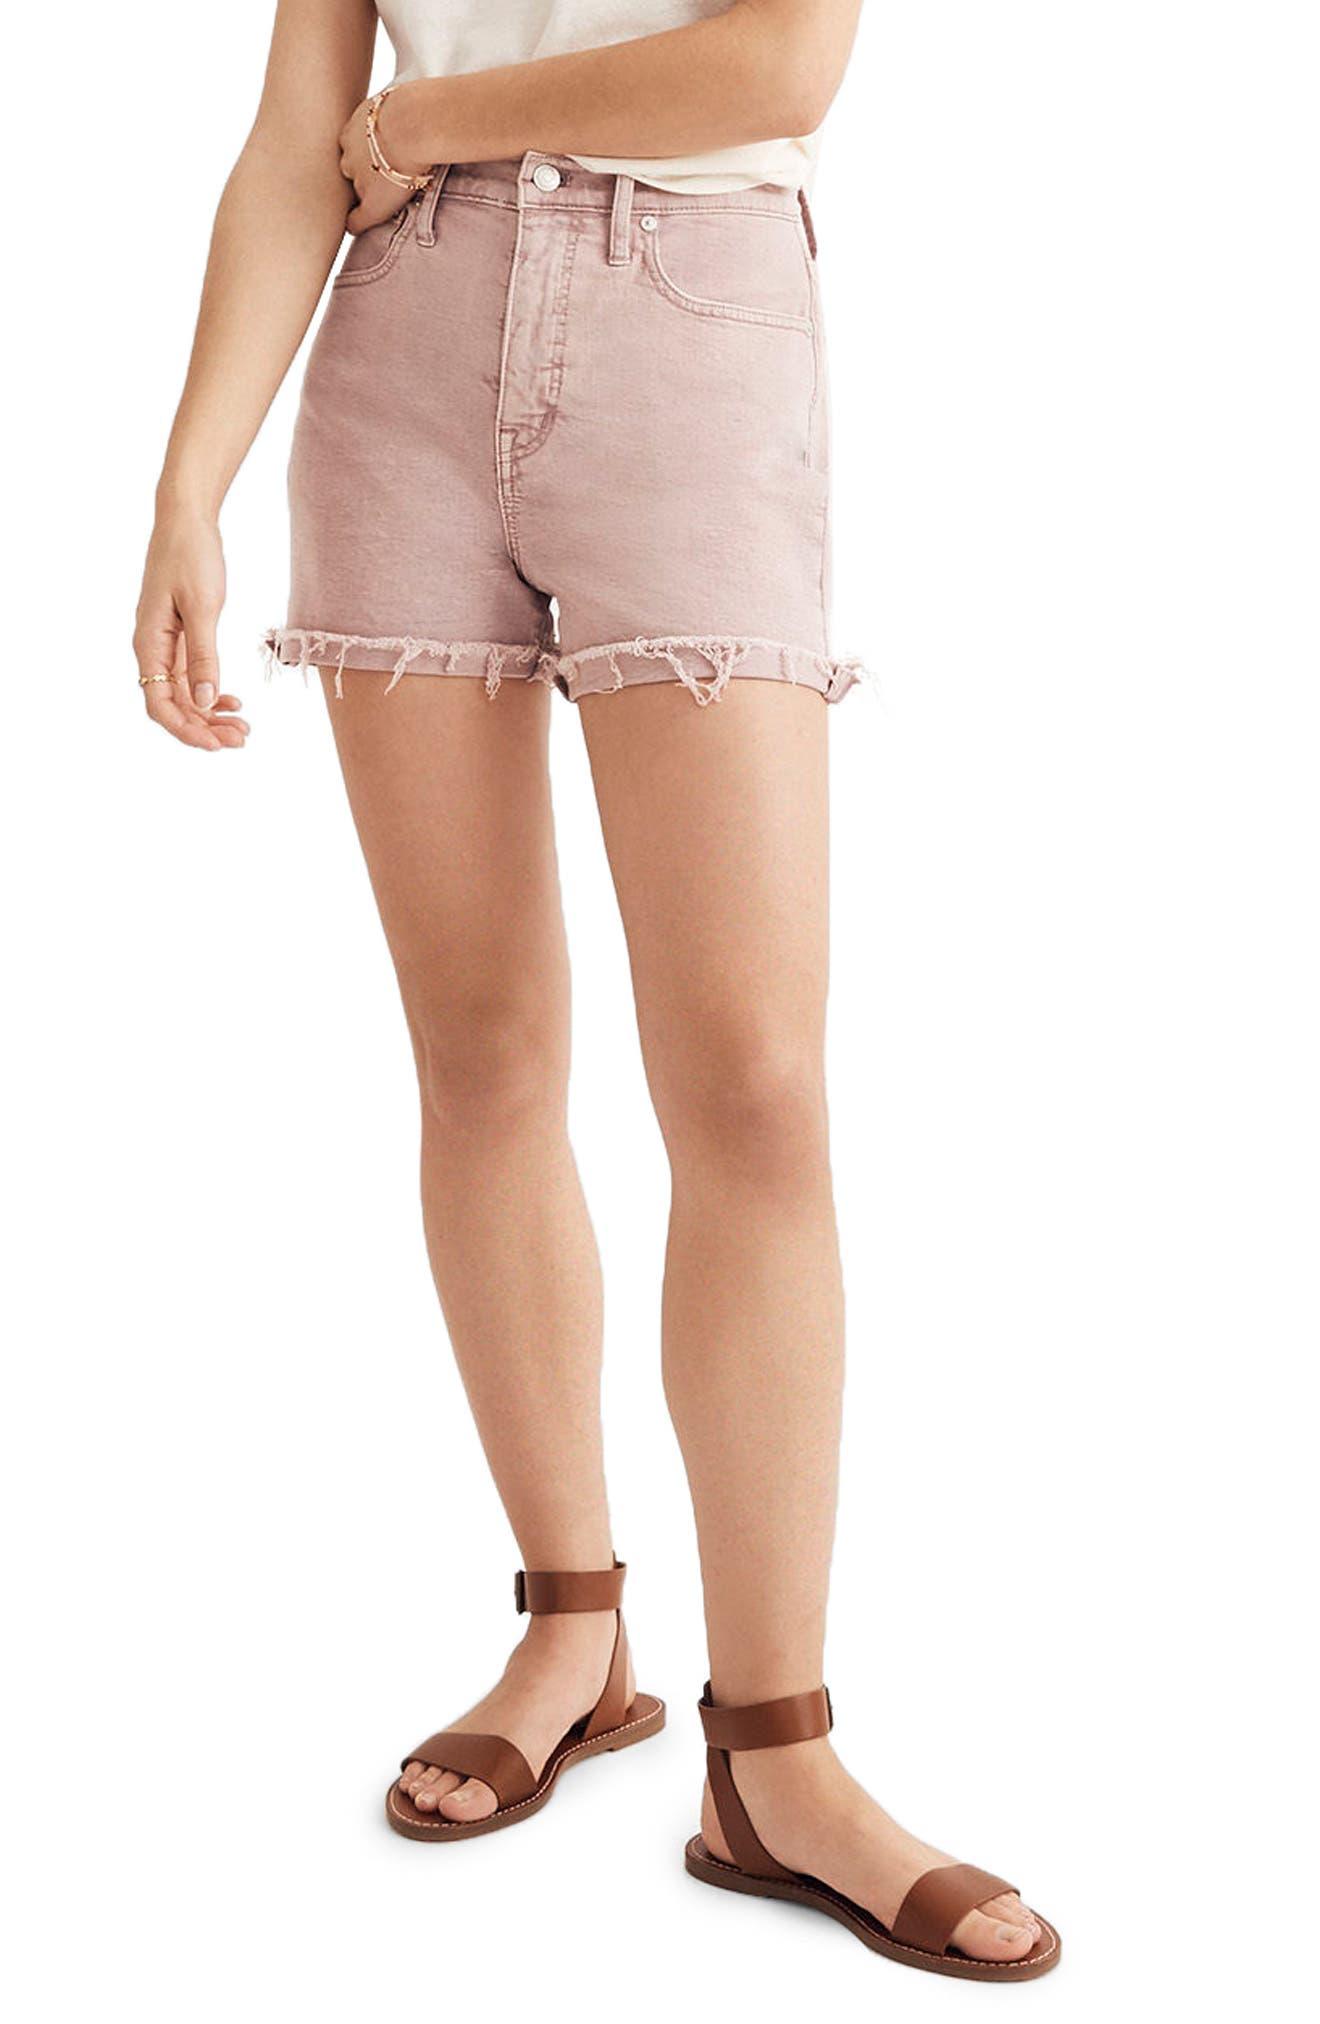 Madewell Garment Dyed High Waist Denim Shorts (Vintage Mauve)